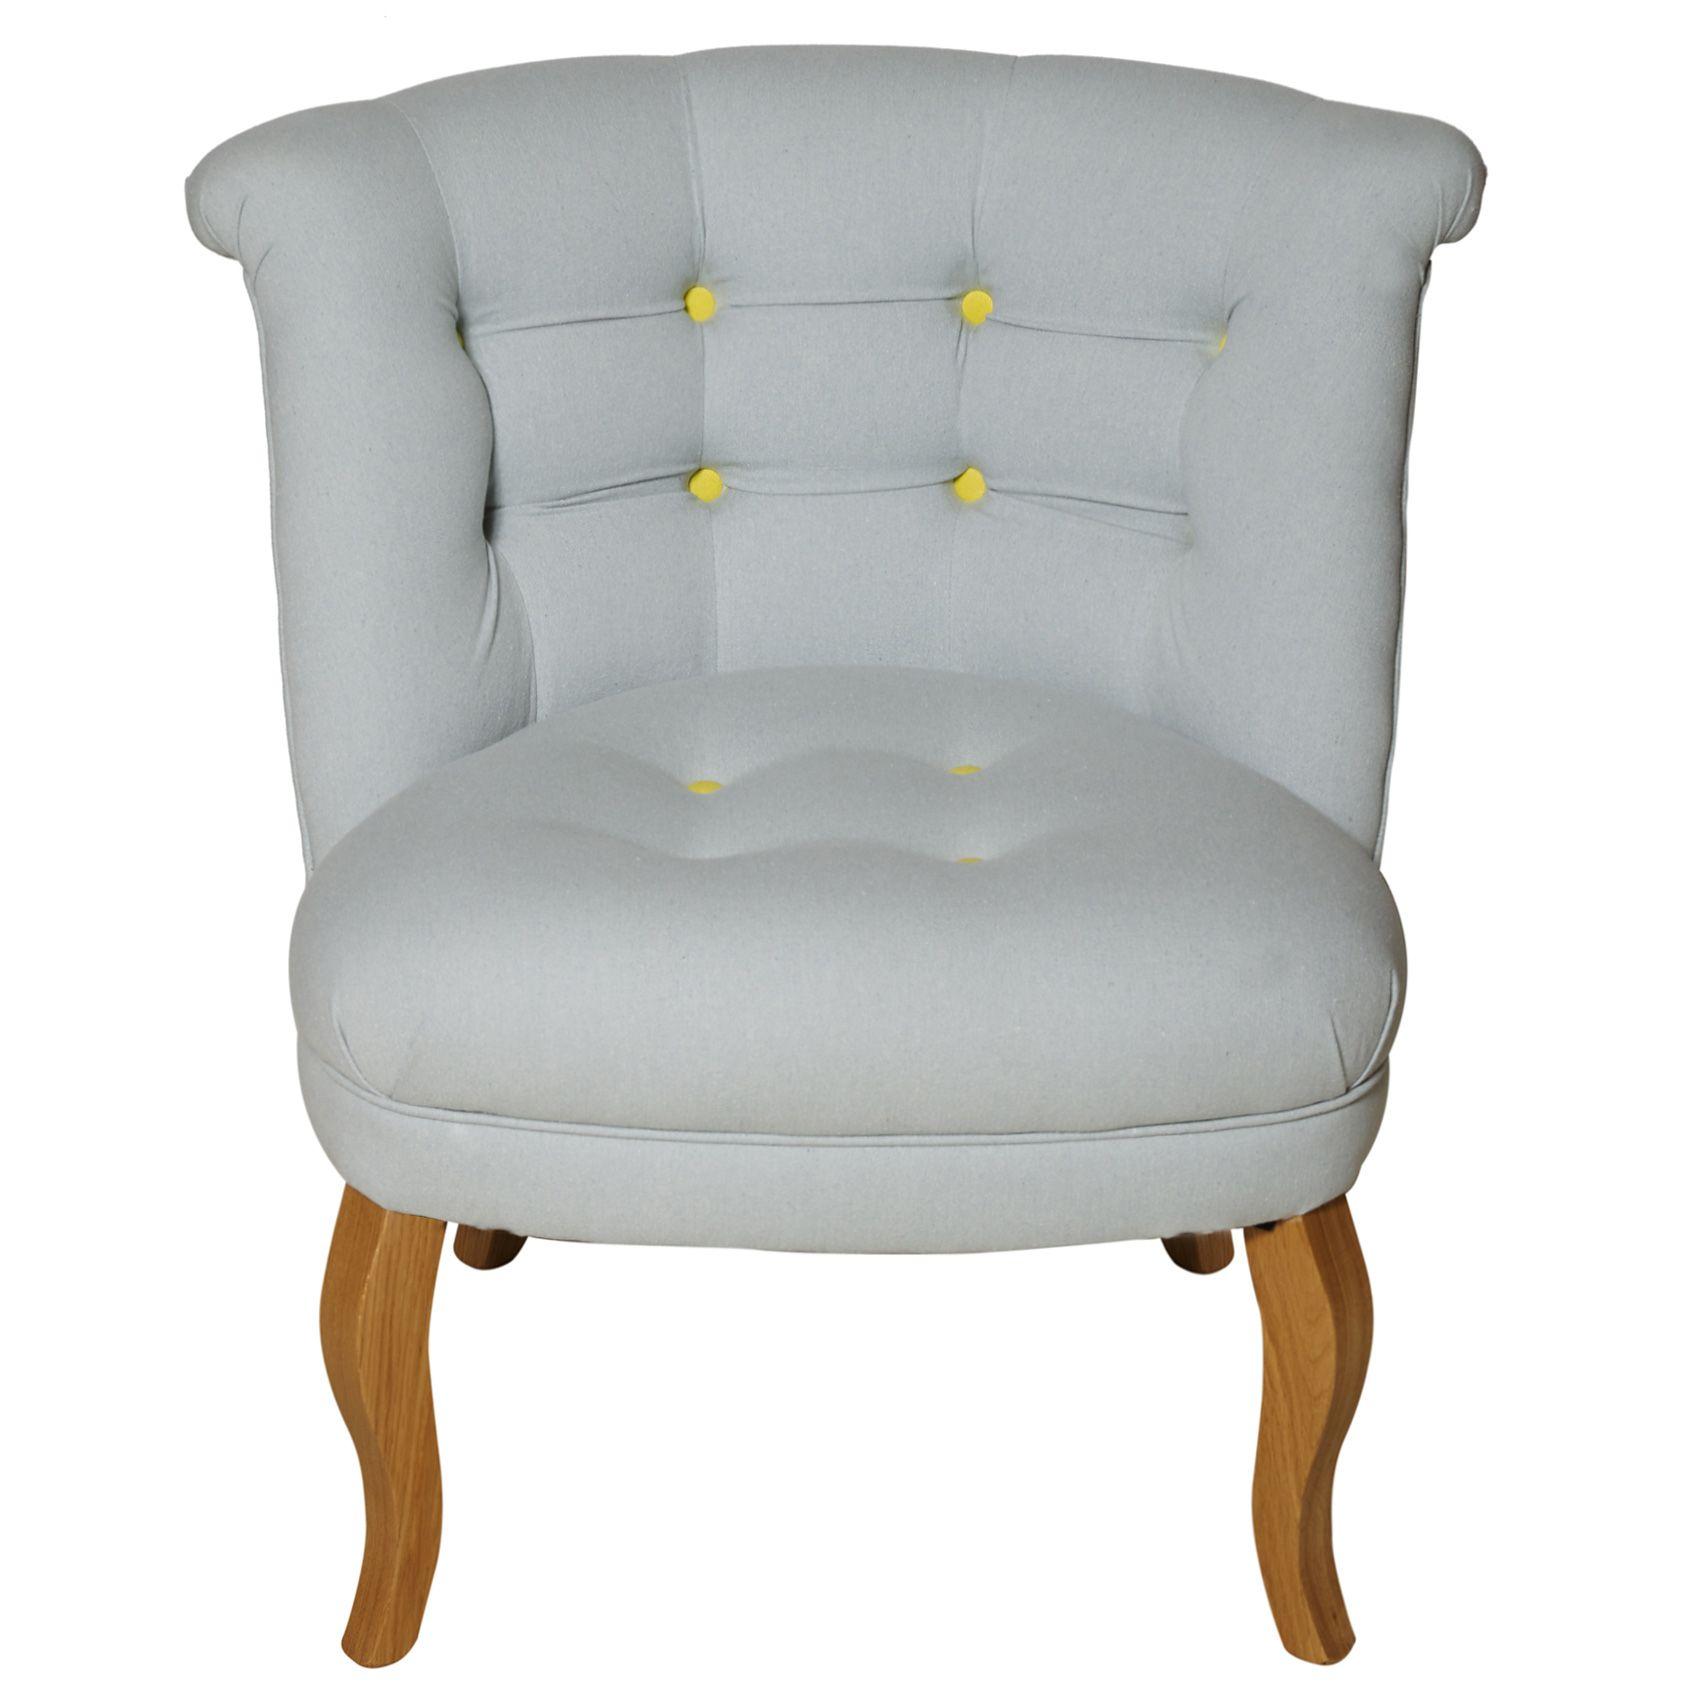 Contrast Button Cotton Tub Chair | Pinterest | Tub chair, Oliver ...